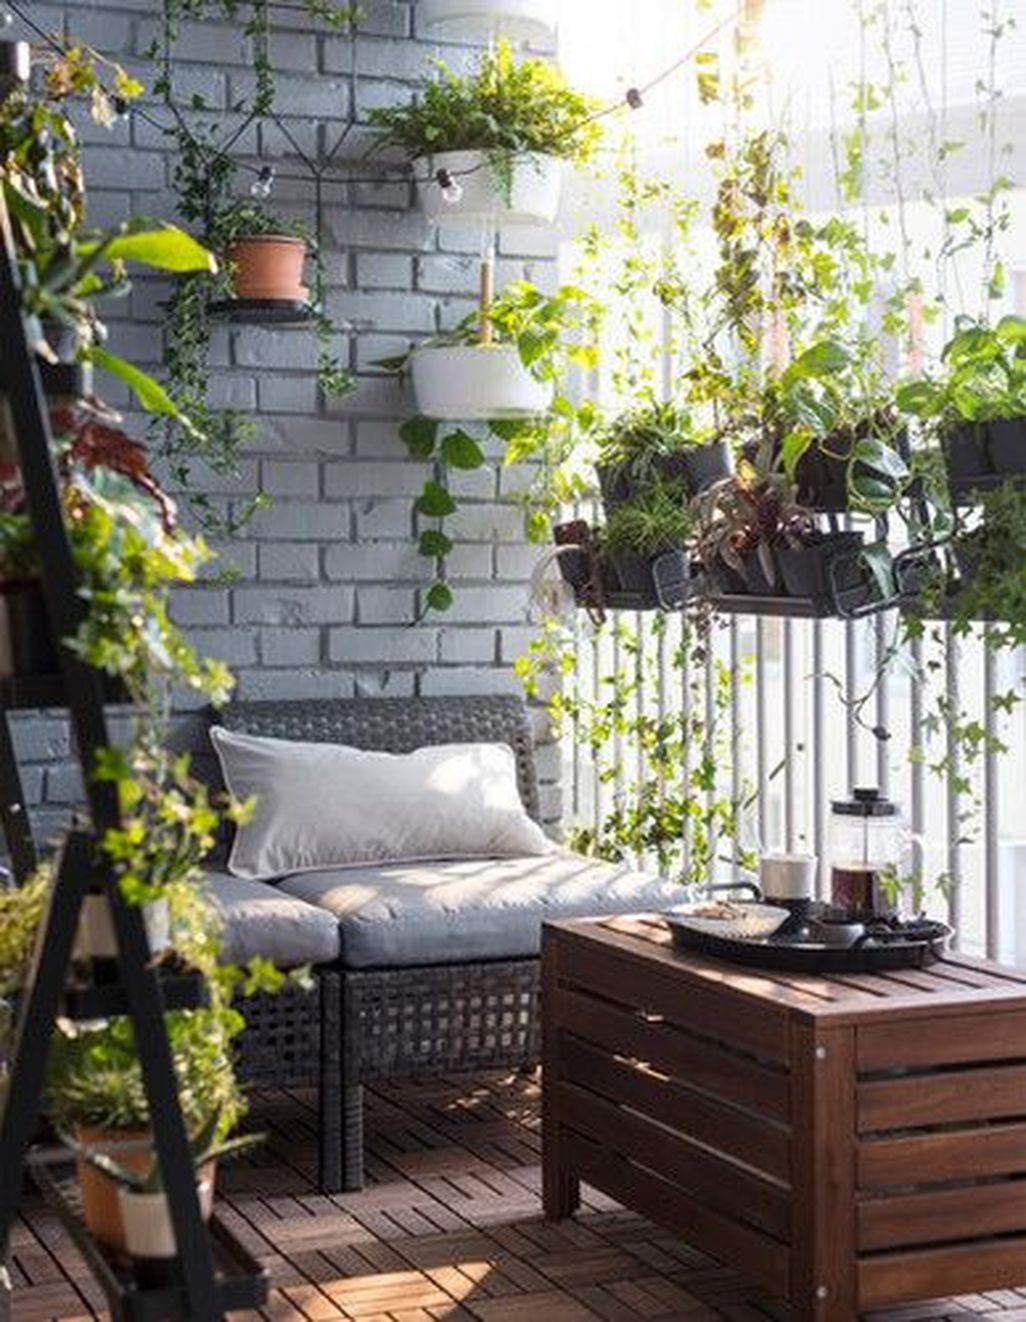 17 Elegant and Cozy Balcony Ideas  Ikea outdoor, Ikea outdoor